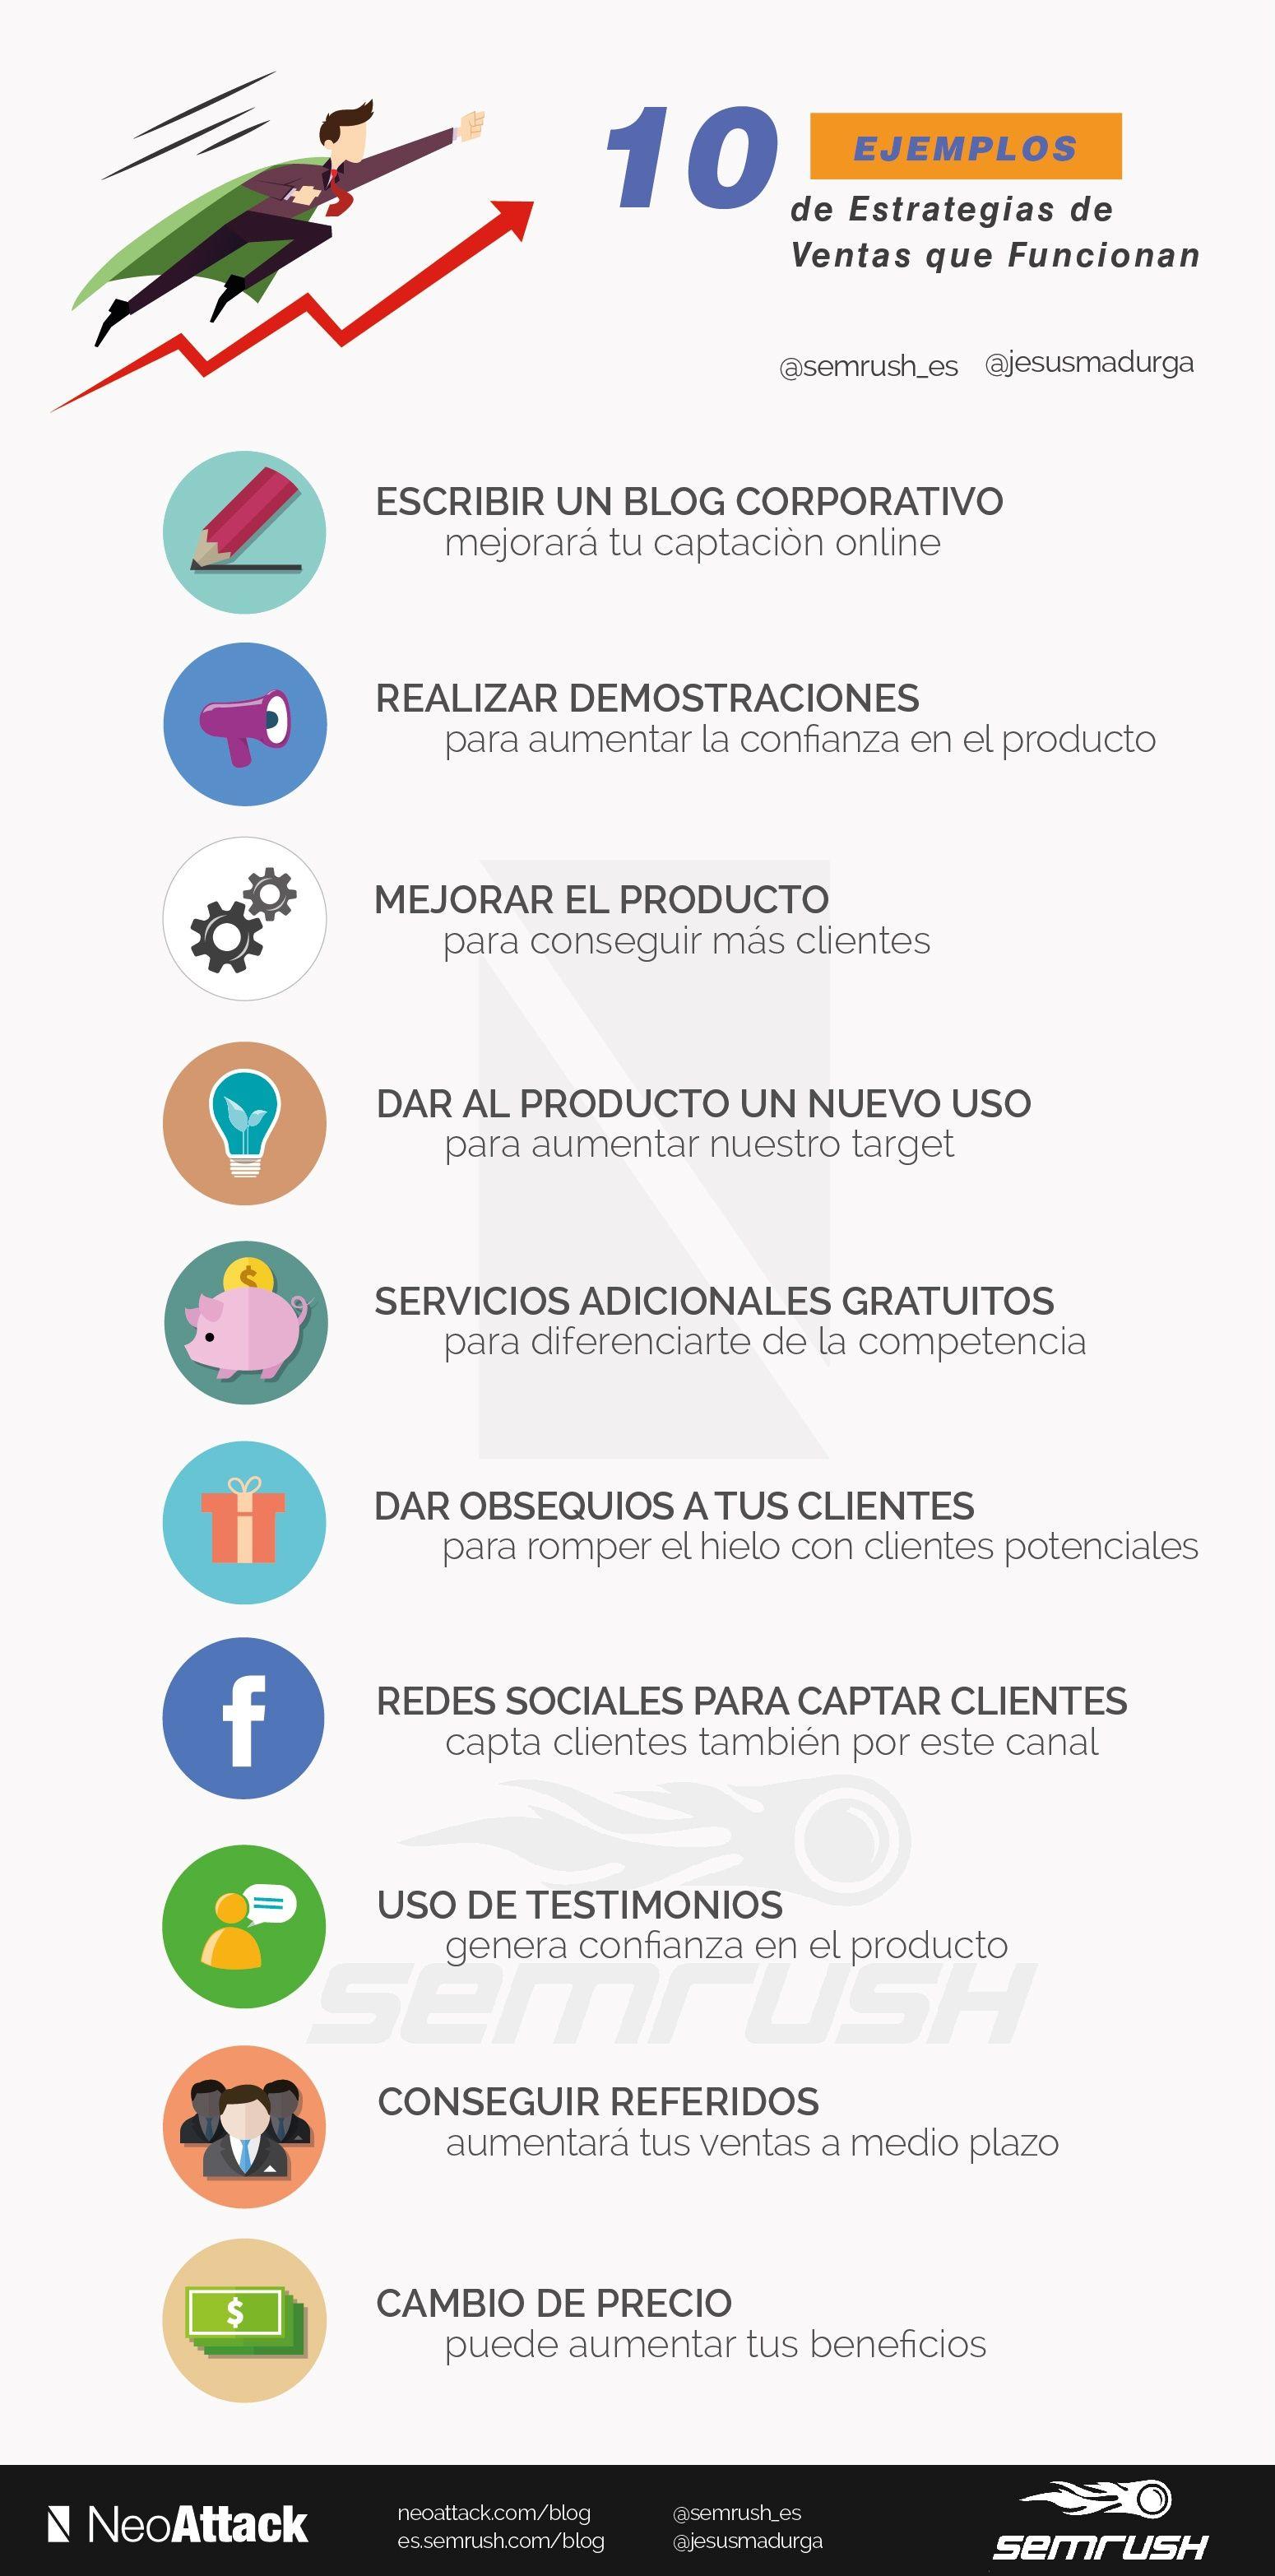 10 Ejemplos De Estrategias De Venta Que Funcionan Digital Marketing Marketing Social Media